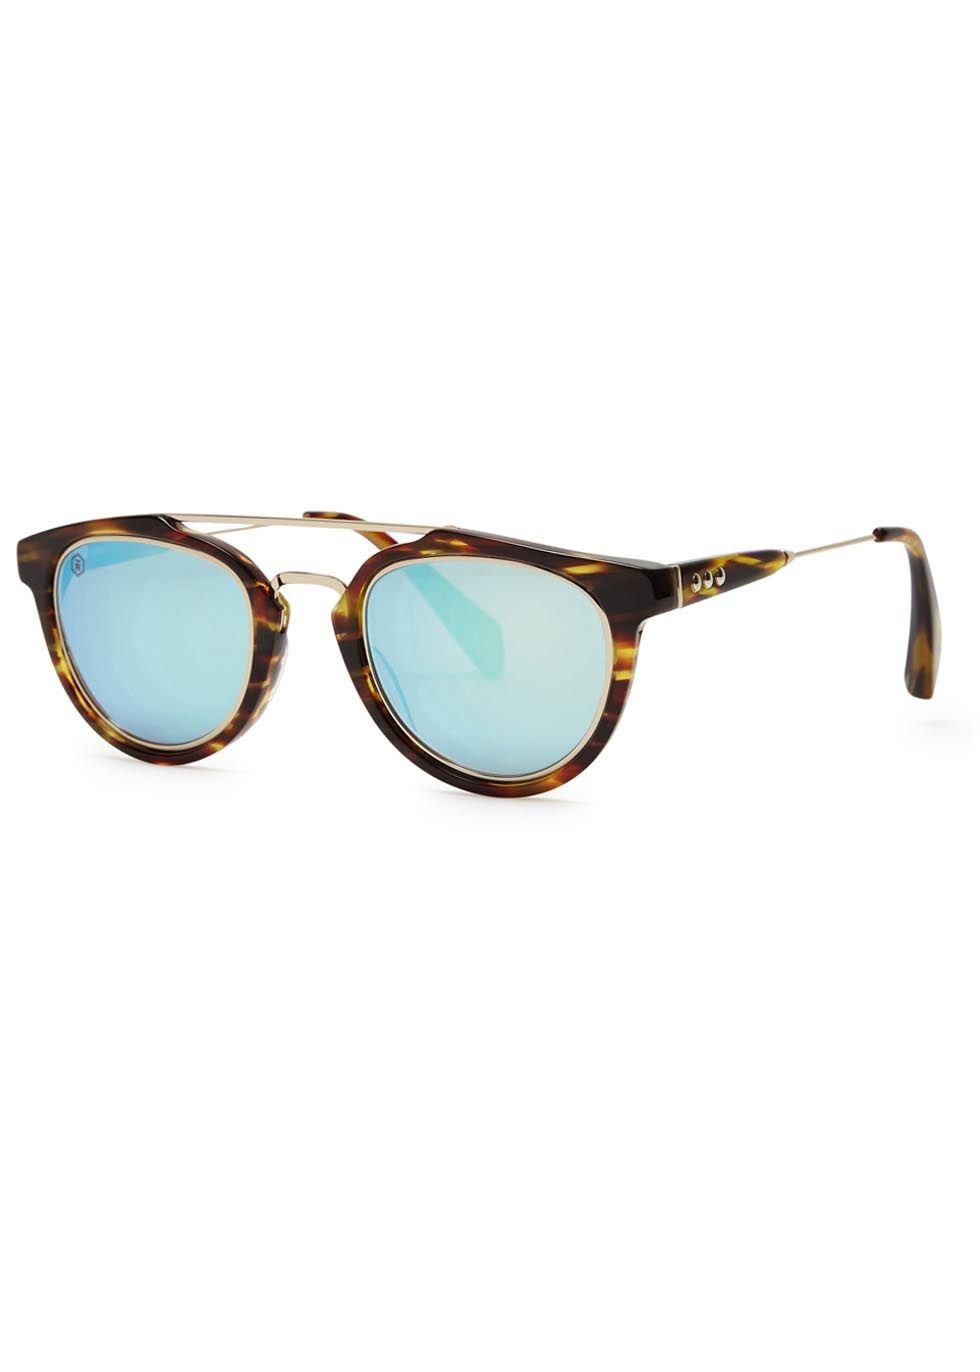 31c4fa61da7 Taylor Morris Eyewear brown tortoiseshell acetate sunglasses  Designer-stamped mirrored cyan lenses